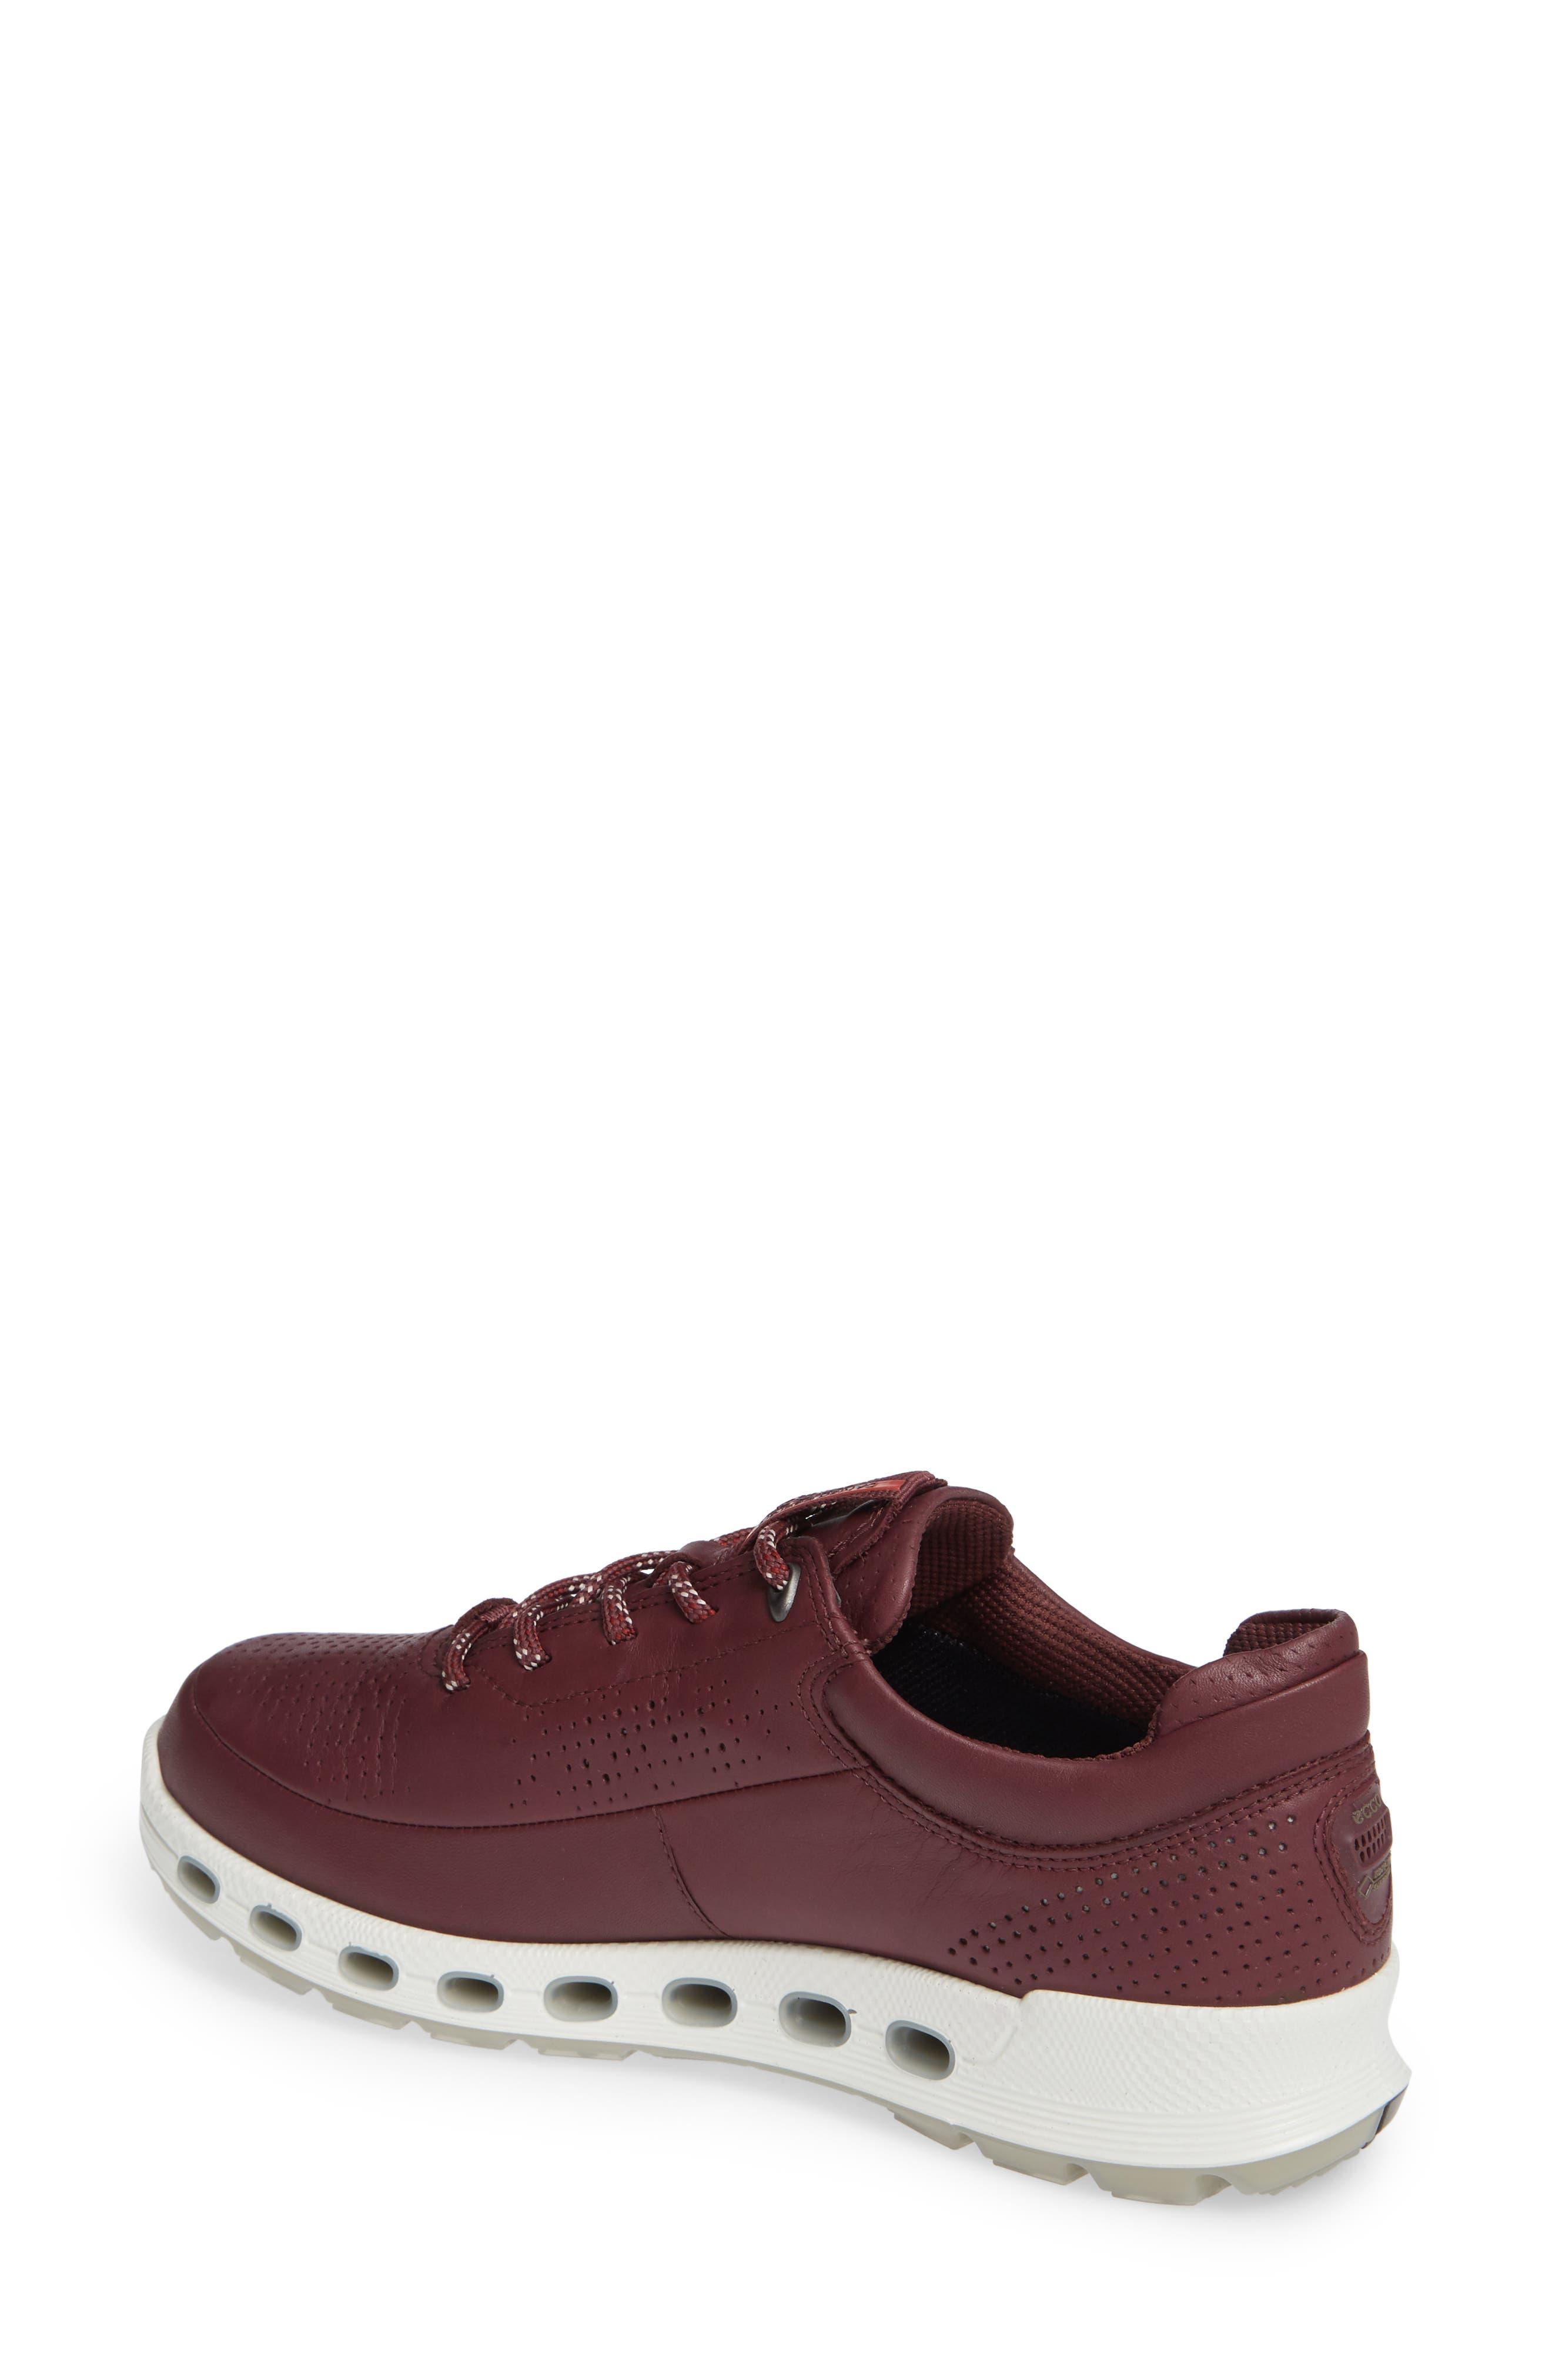 Cool 2.0 GTX Waterproof Sneaker,                             Alternate thumbnail 2, color,                             WINE LEATHER